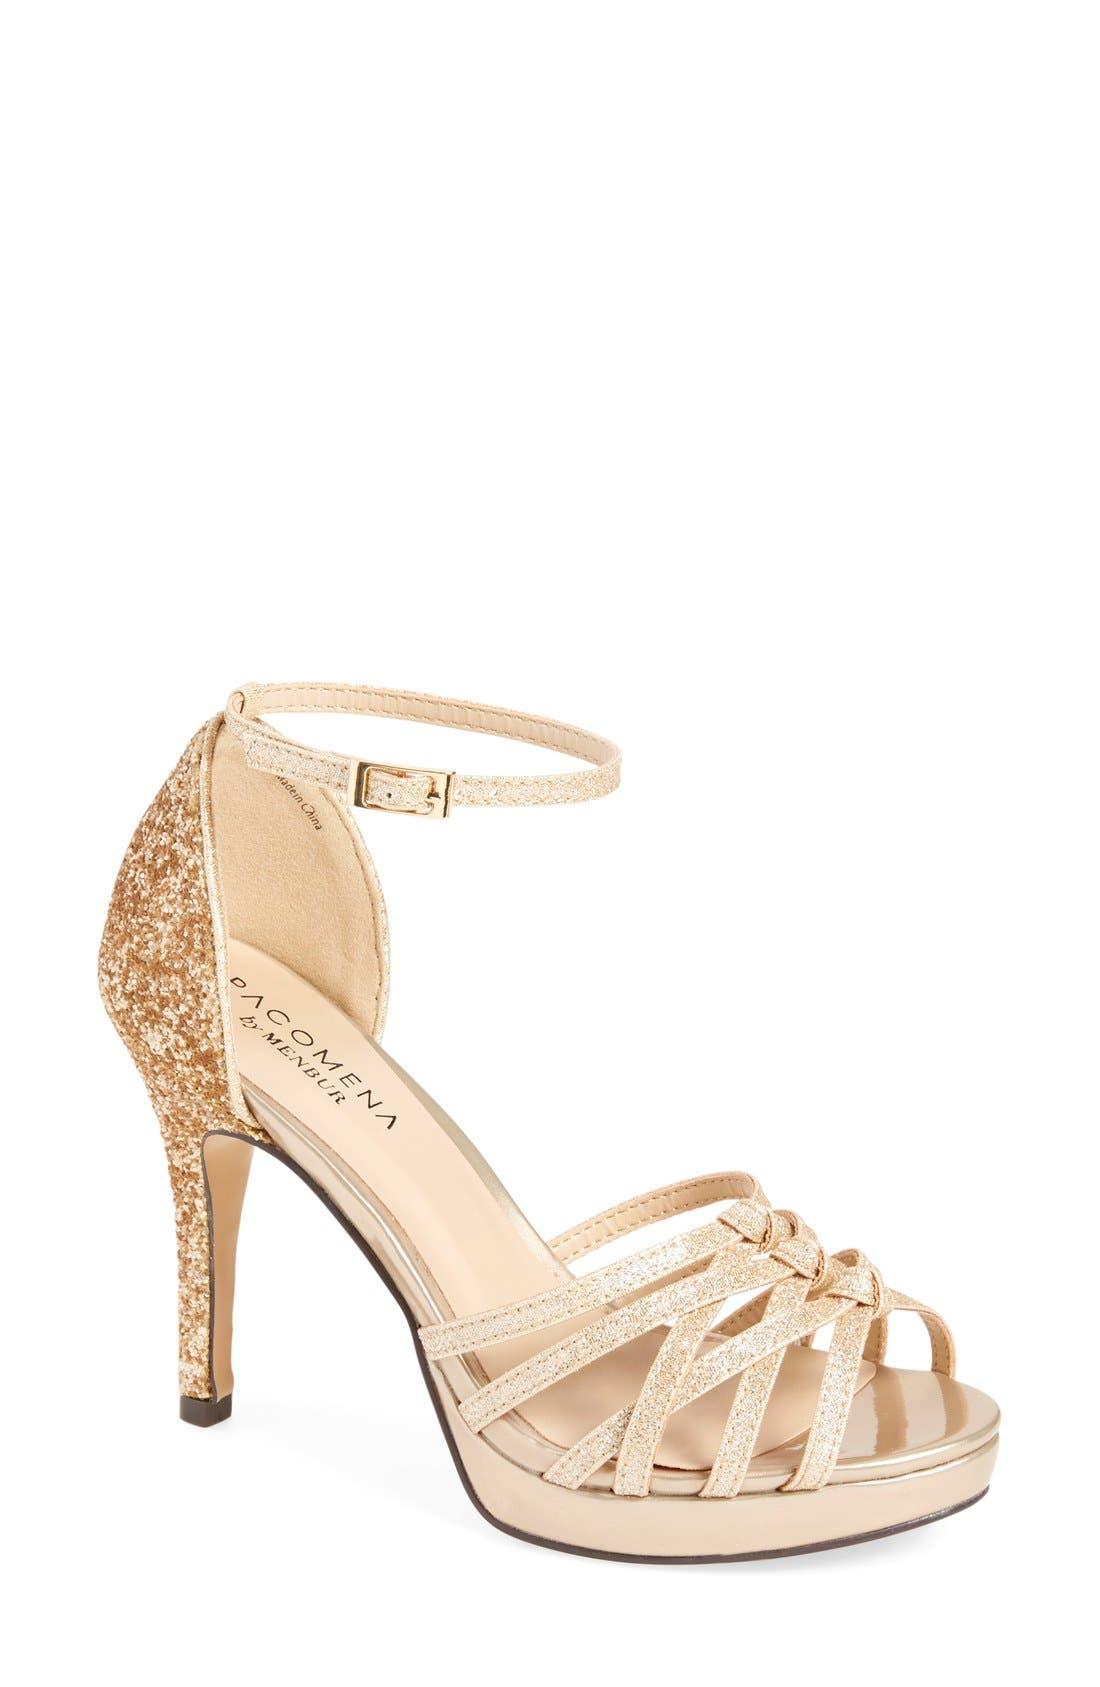 MENBUR 'Torenia' Evening Sandal